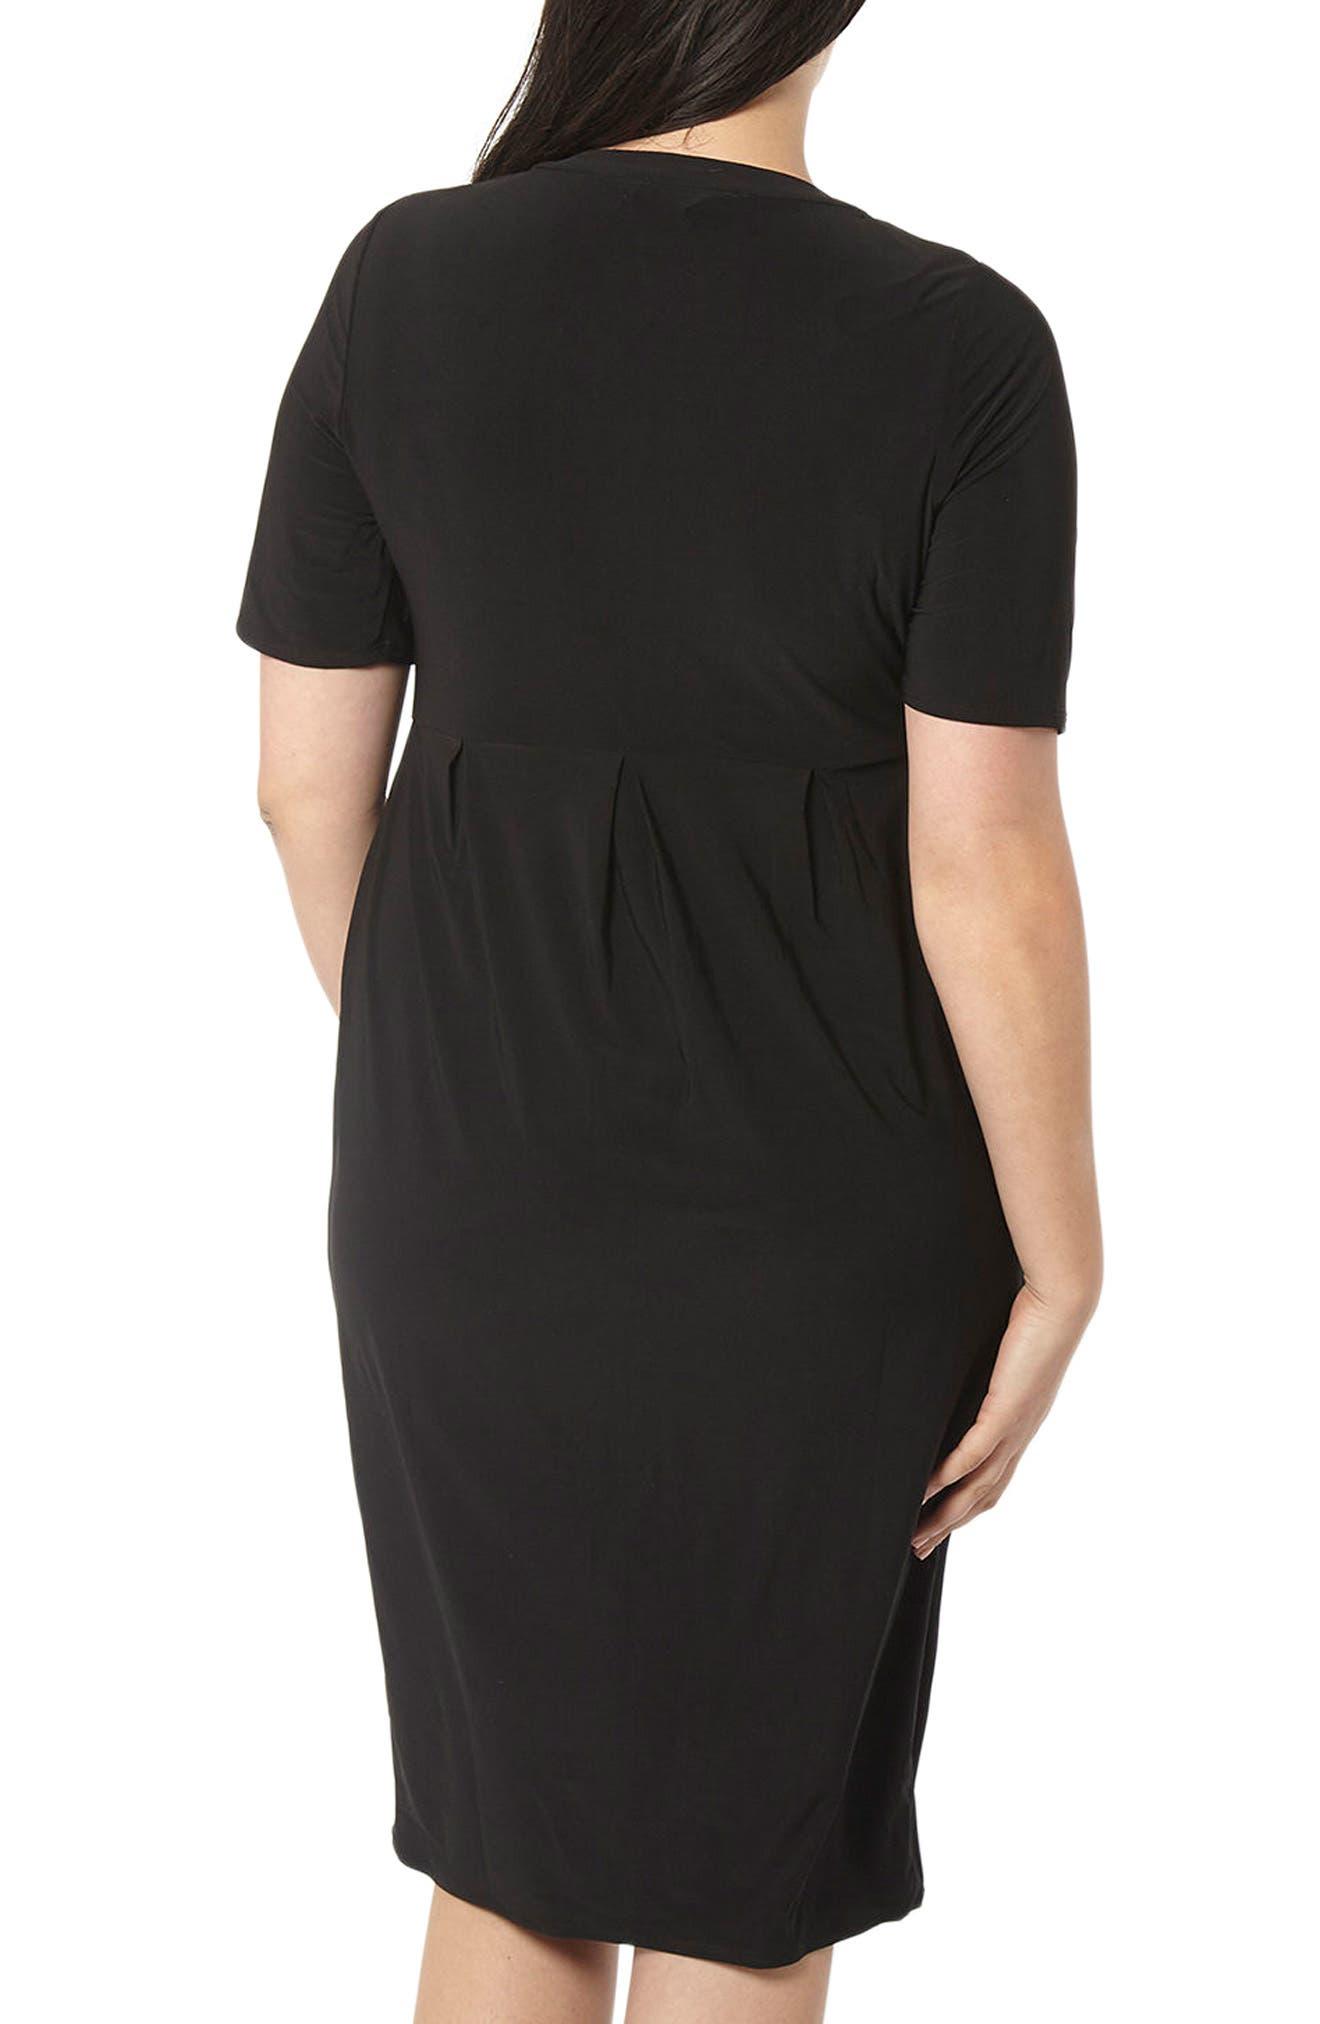 Alternate Image 3  - Evans Pleat Jersey Dress (Plus Size)